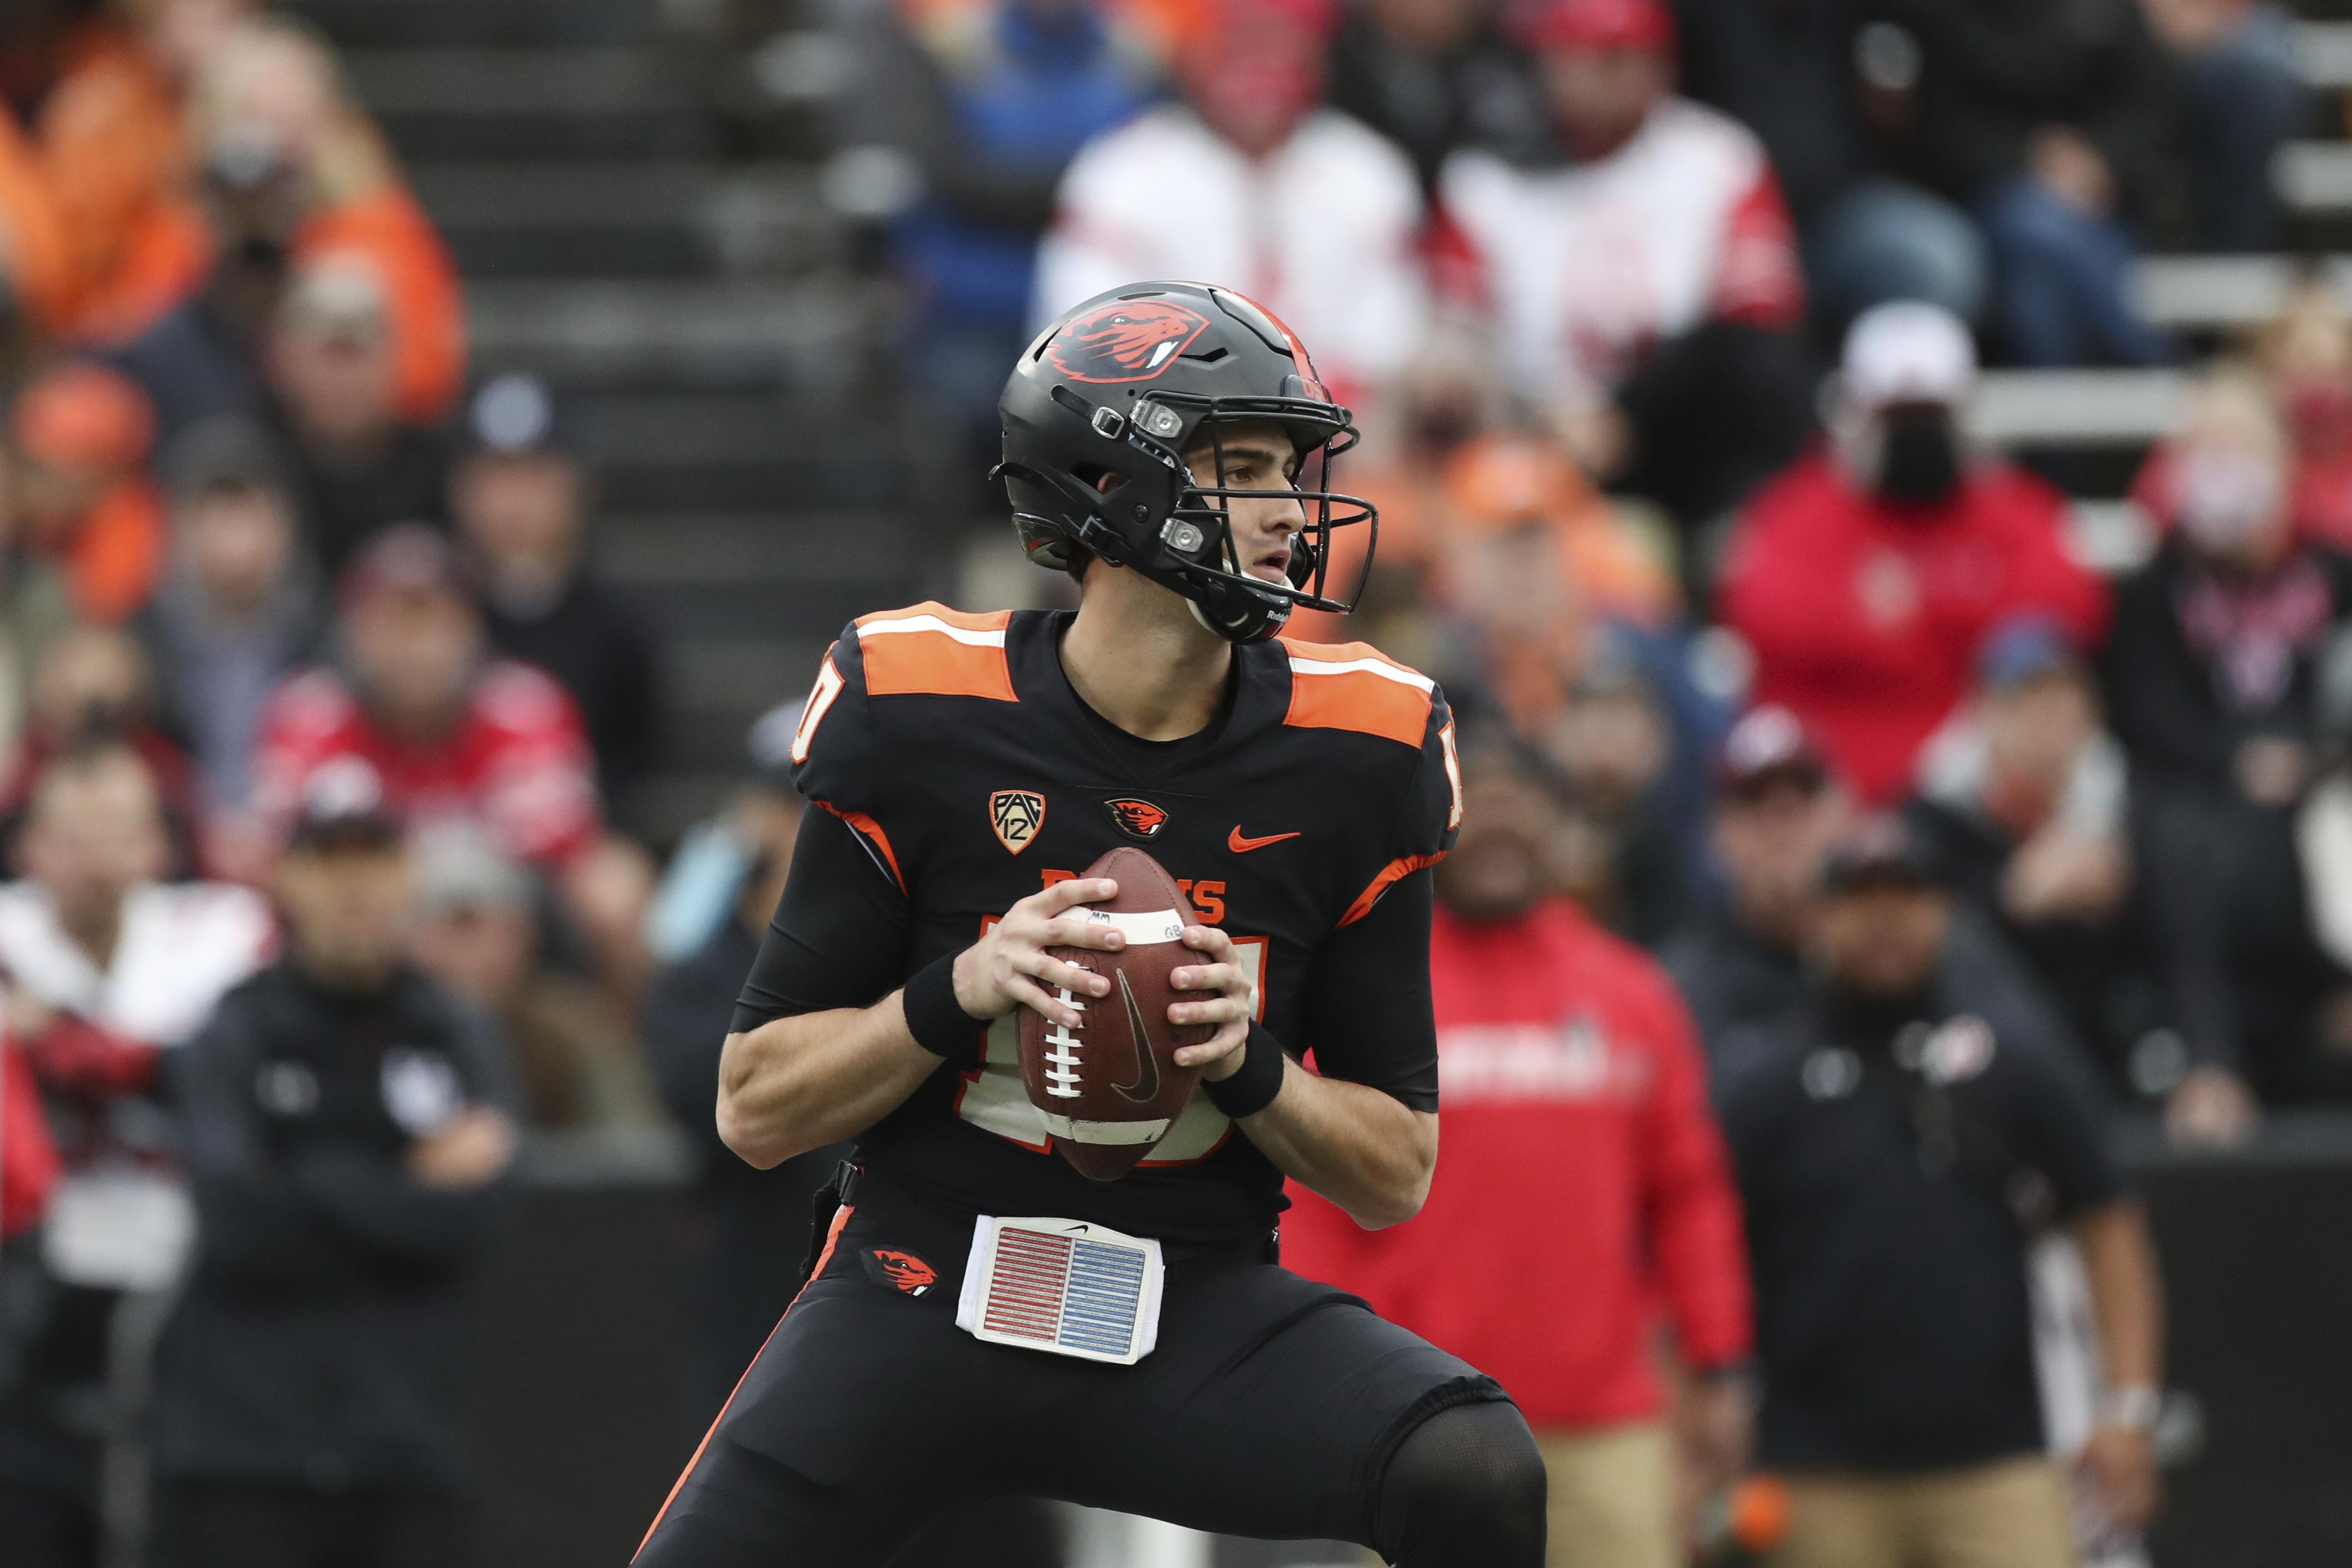 Oregon State quarterback Chance Nolan looks for a receiver